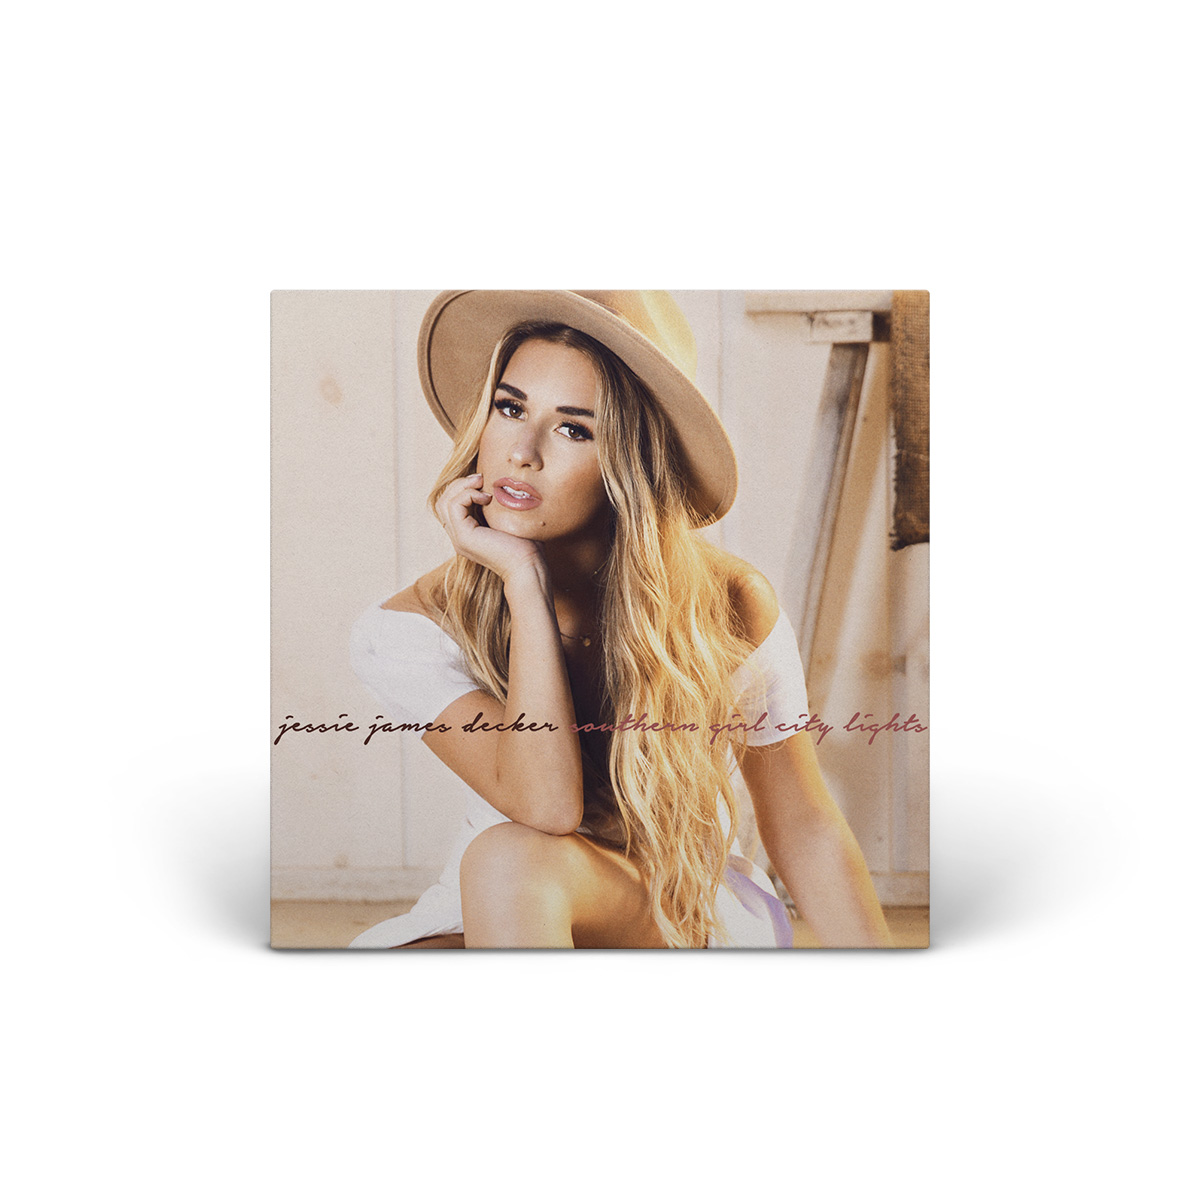 AUTOGRAPHED Jessie James Decker - Southern Girl City Lights CD + Digital Download